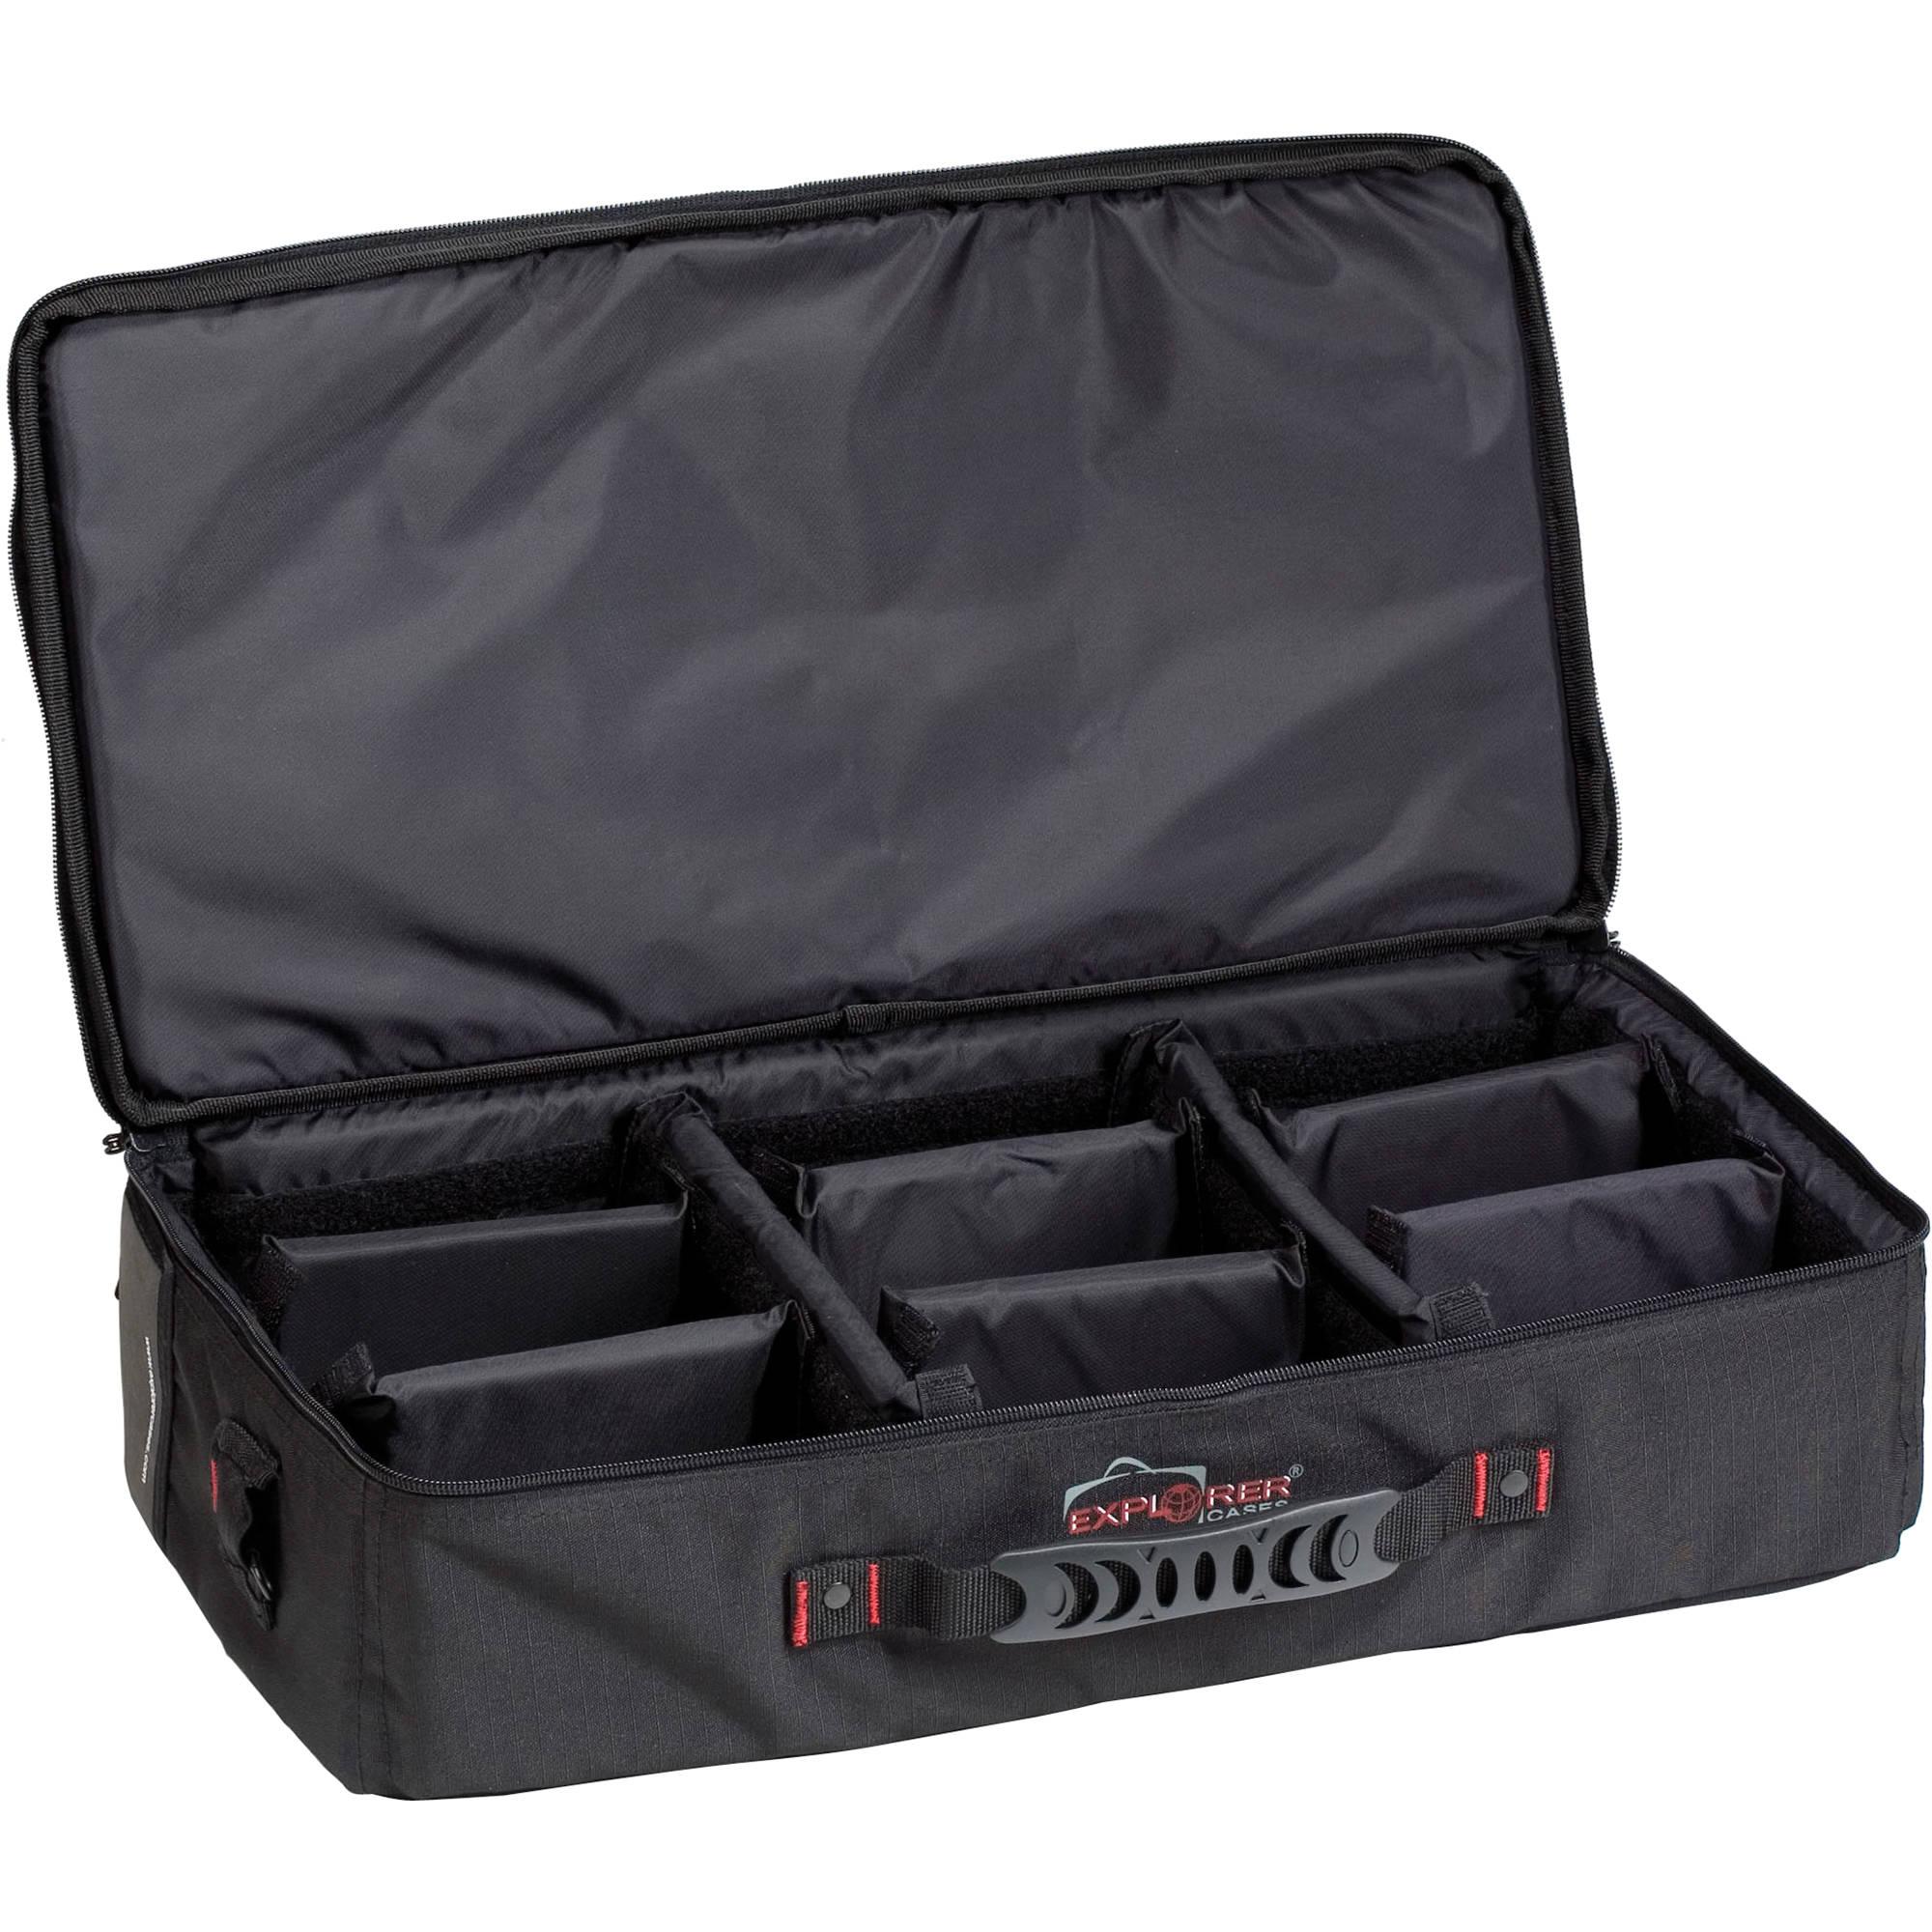 Https C Product 1077113 Reg Lifeproof Ipad Air Fre Case 1907 02 Glacier Explorer Cases Ecbm Bagb Bag G With Dividers For 1121591